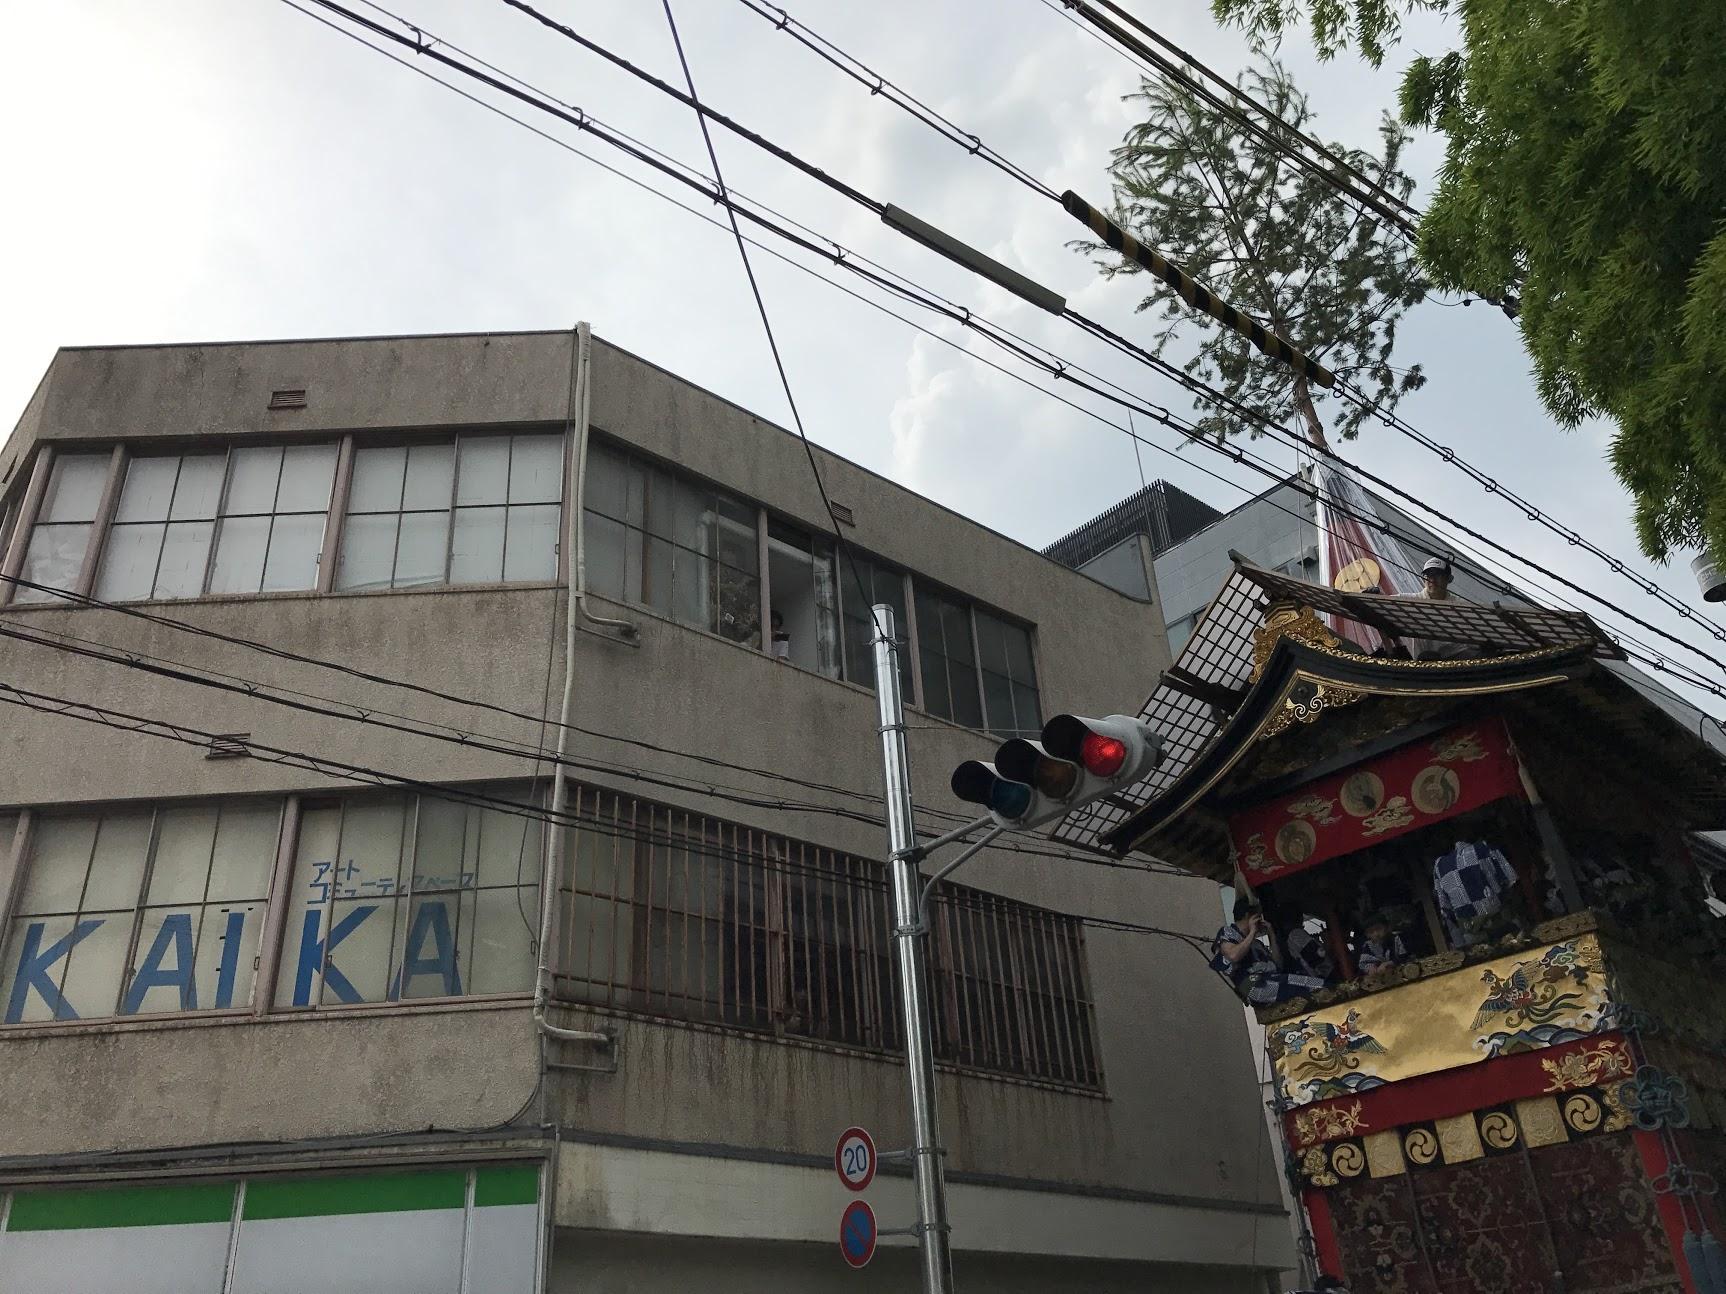 KAIKA 7月の催し